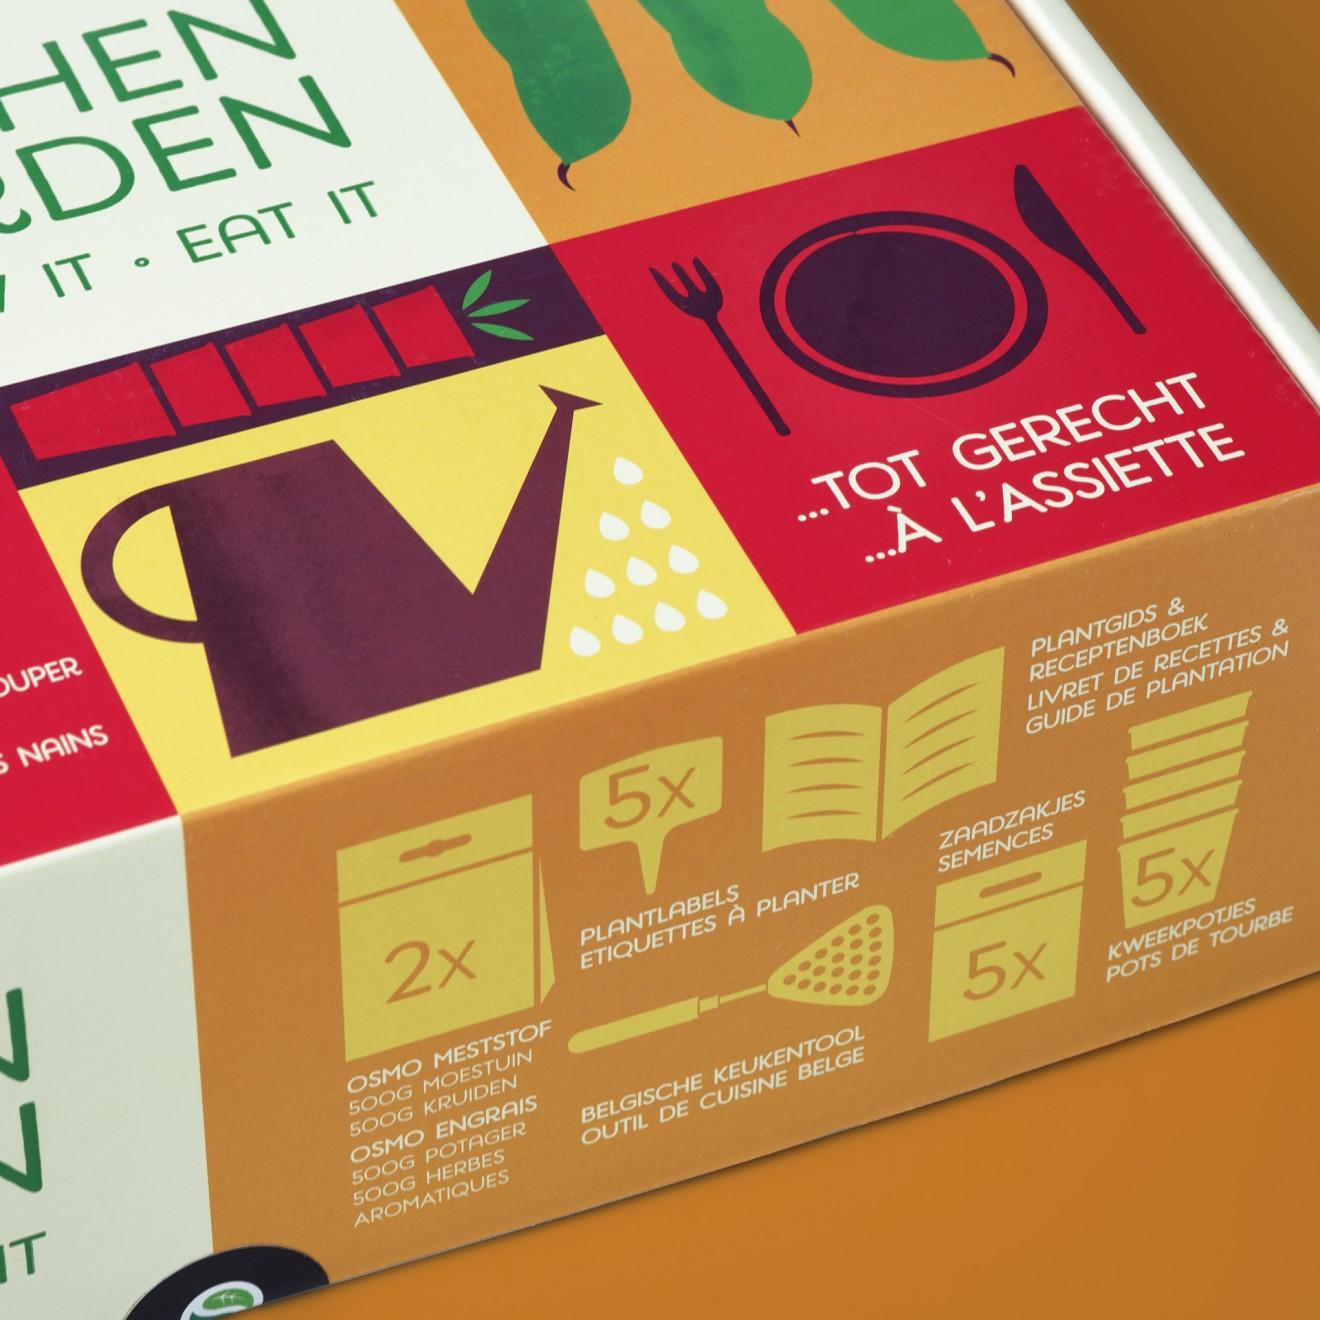 Quatre Mains package design - peas, box, cooking, planting